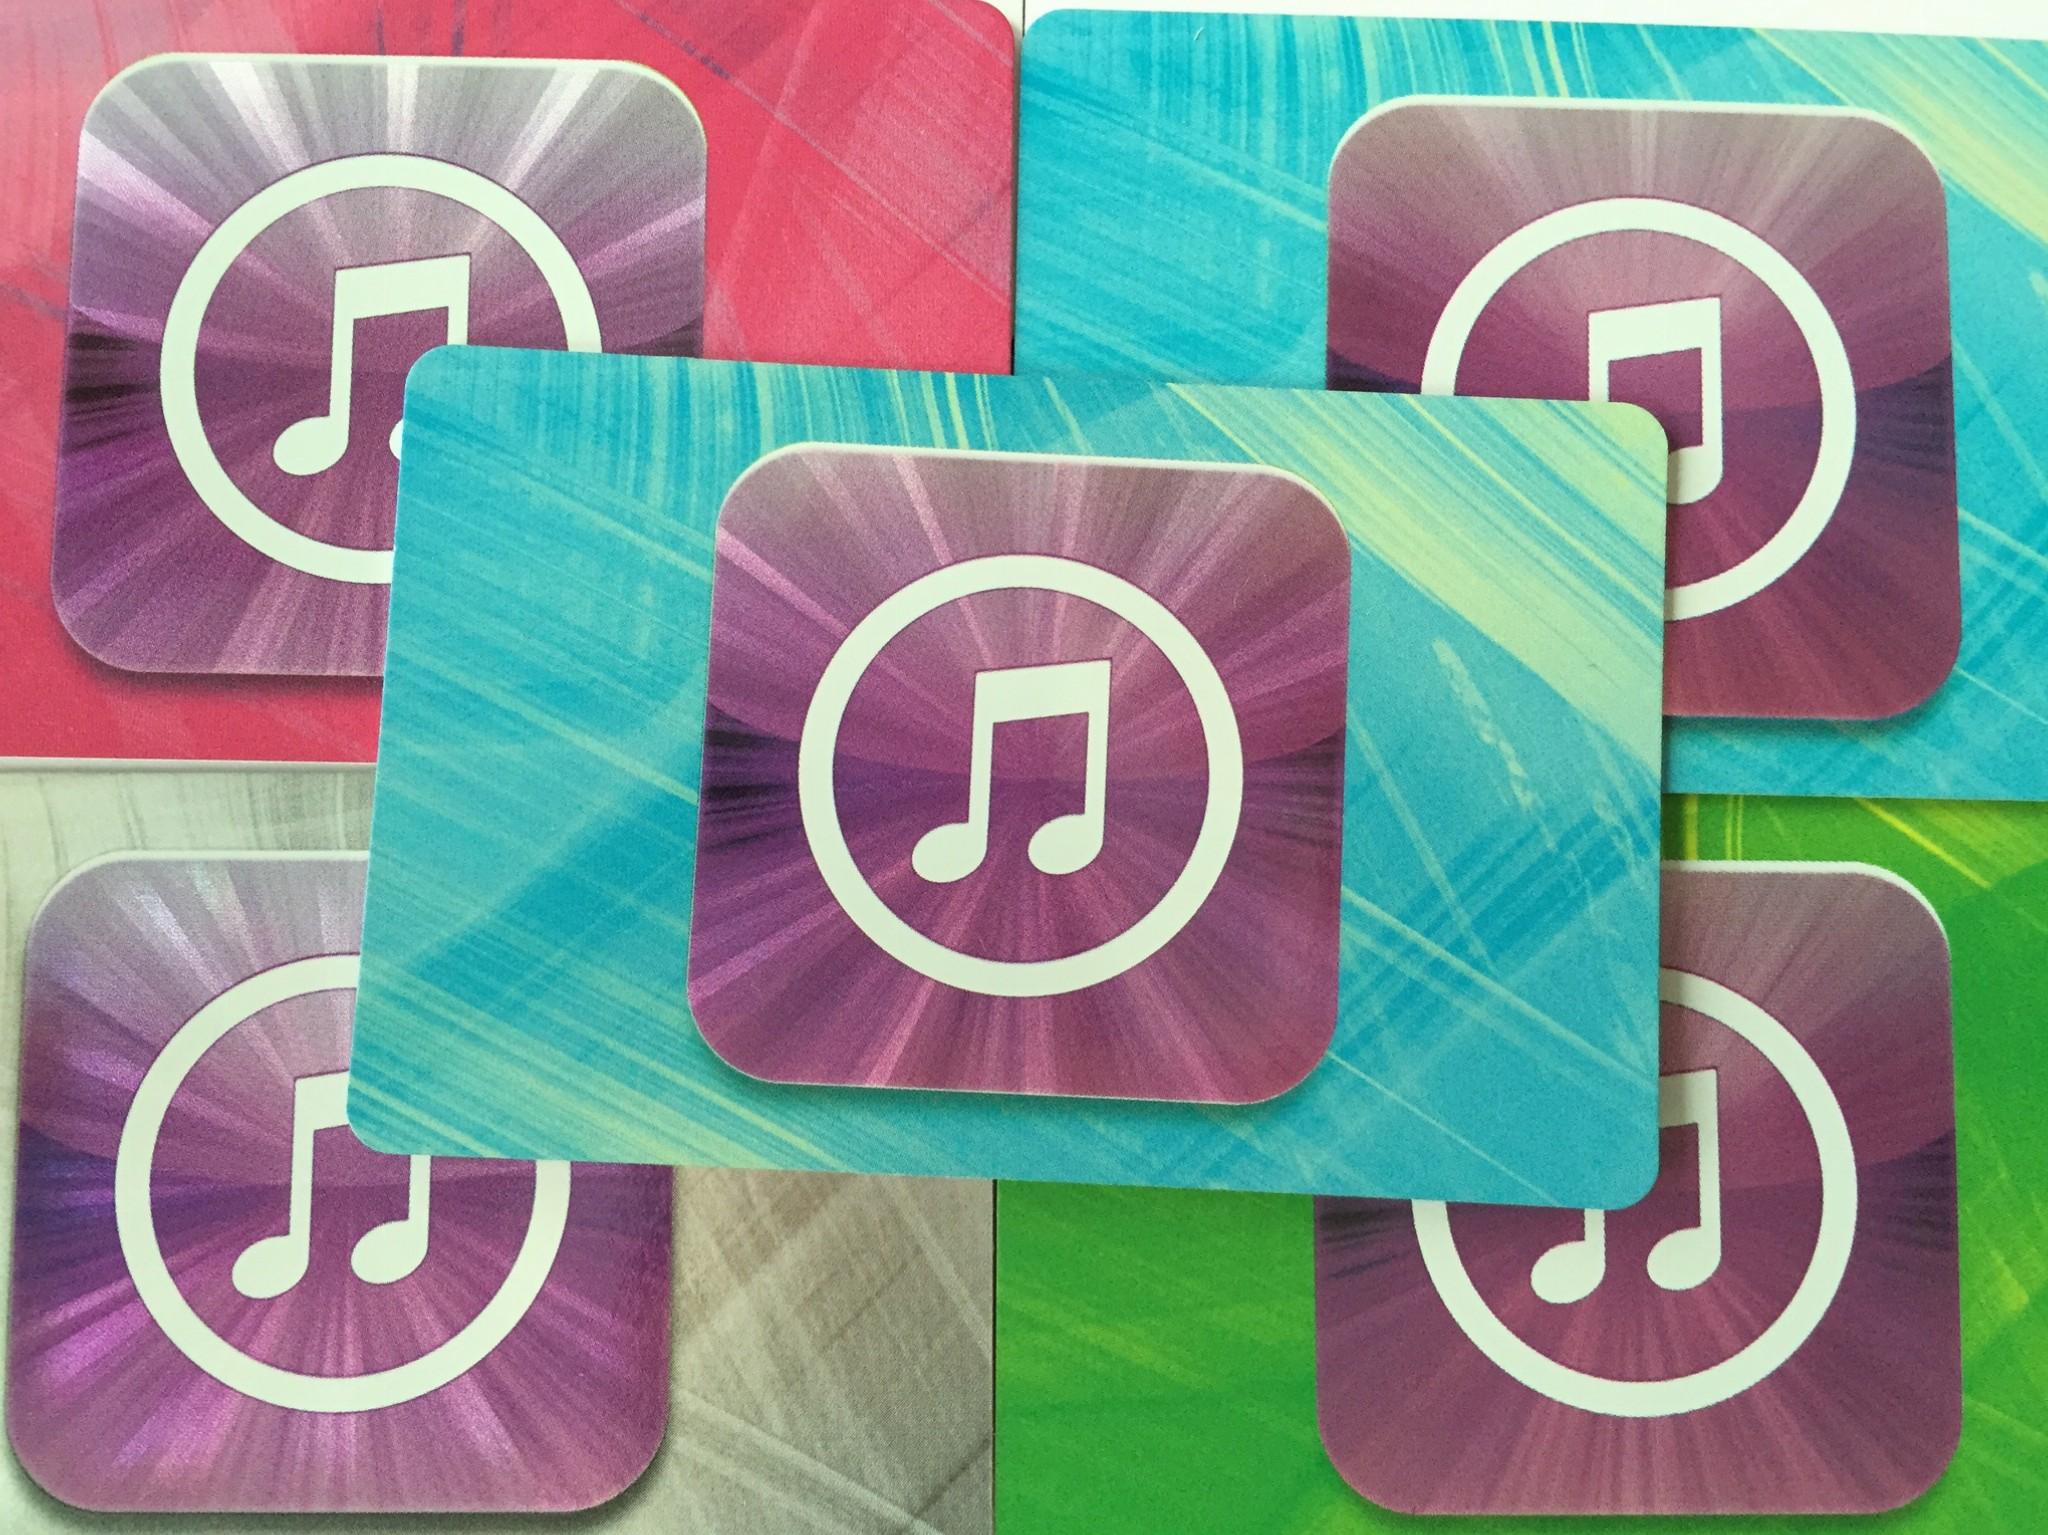 15% Rabatt auf alle iTunes Karten!